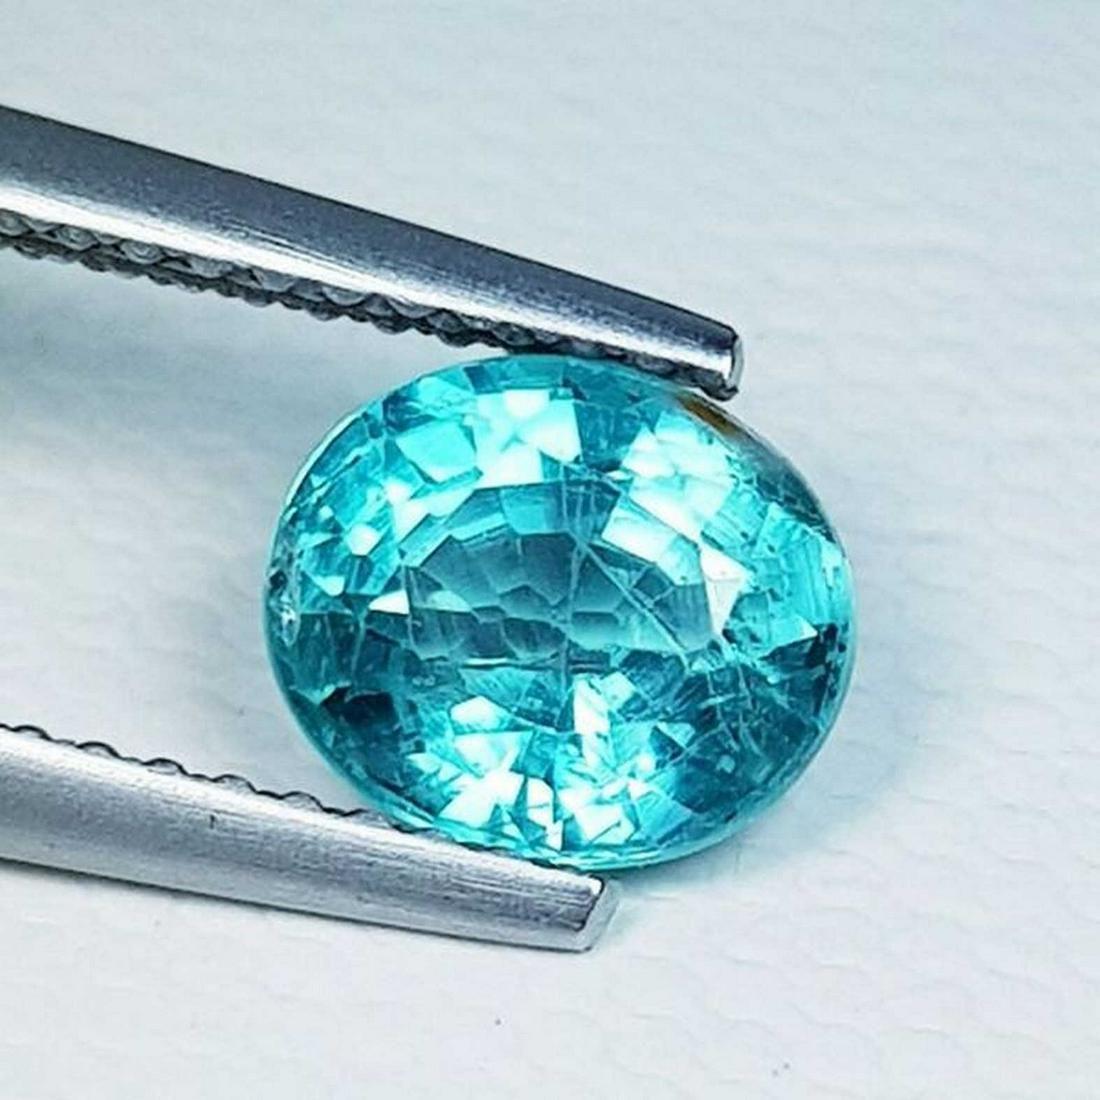 1.58 ct Natural Bluish Green Apatite Oval Cut